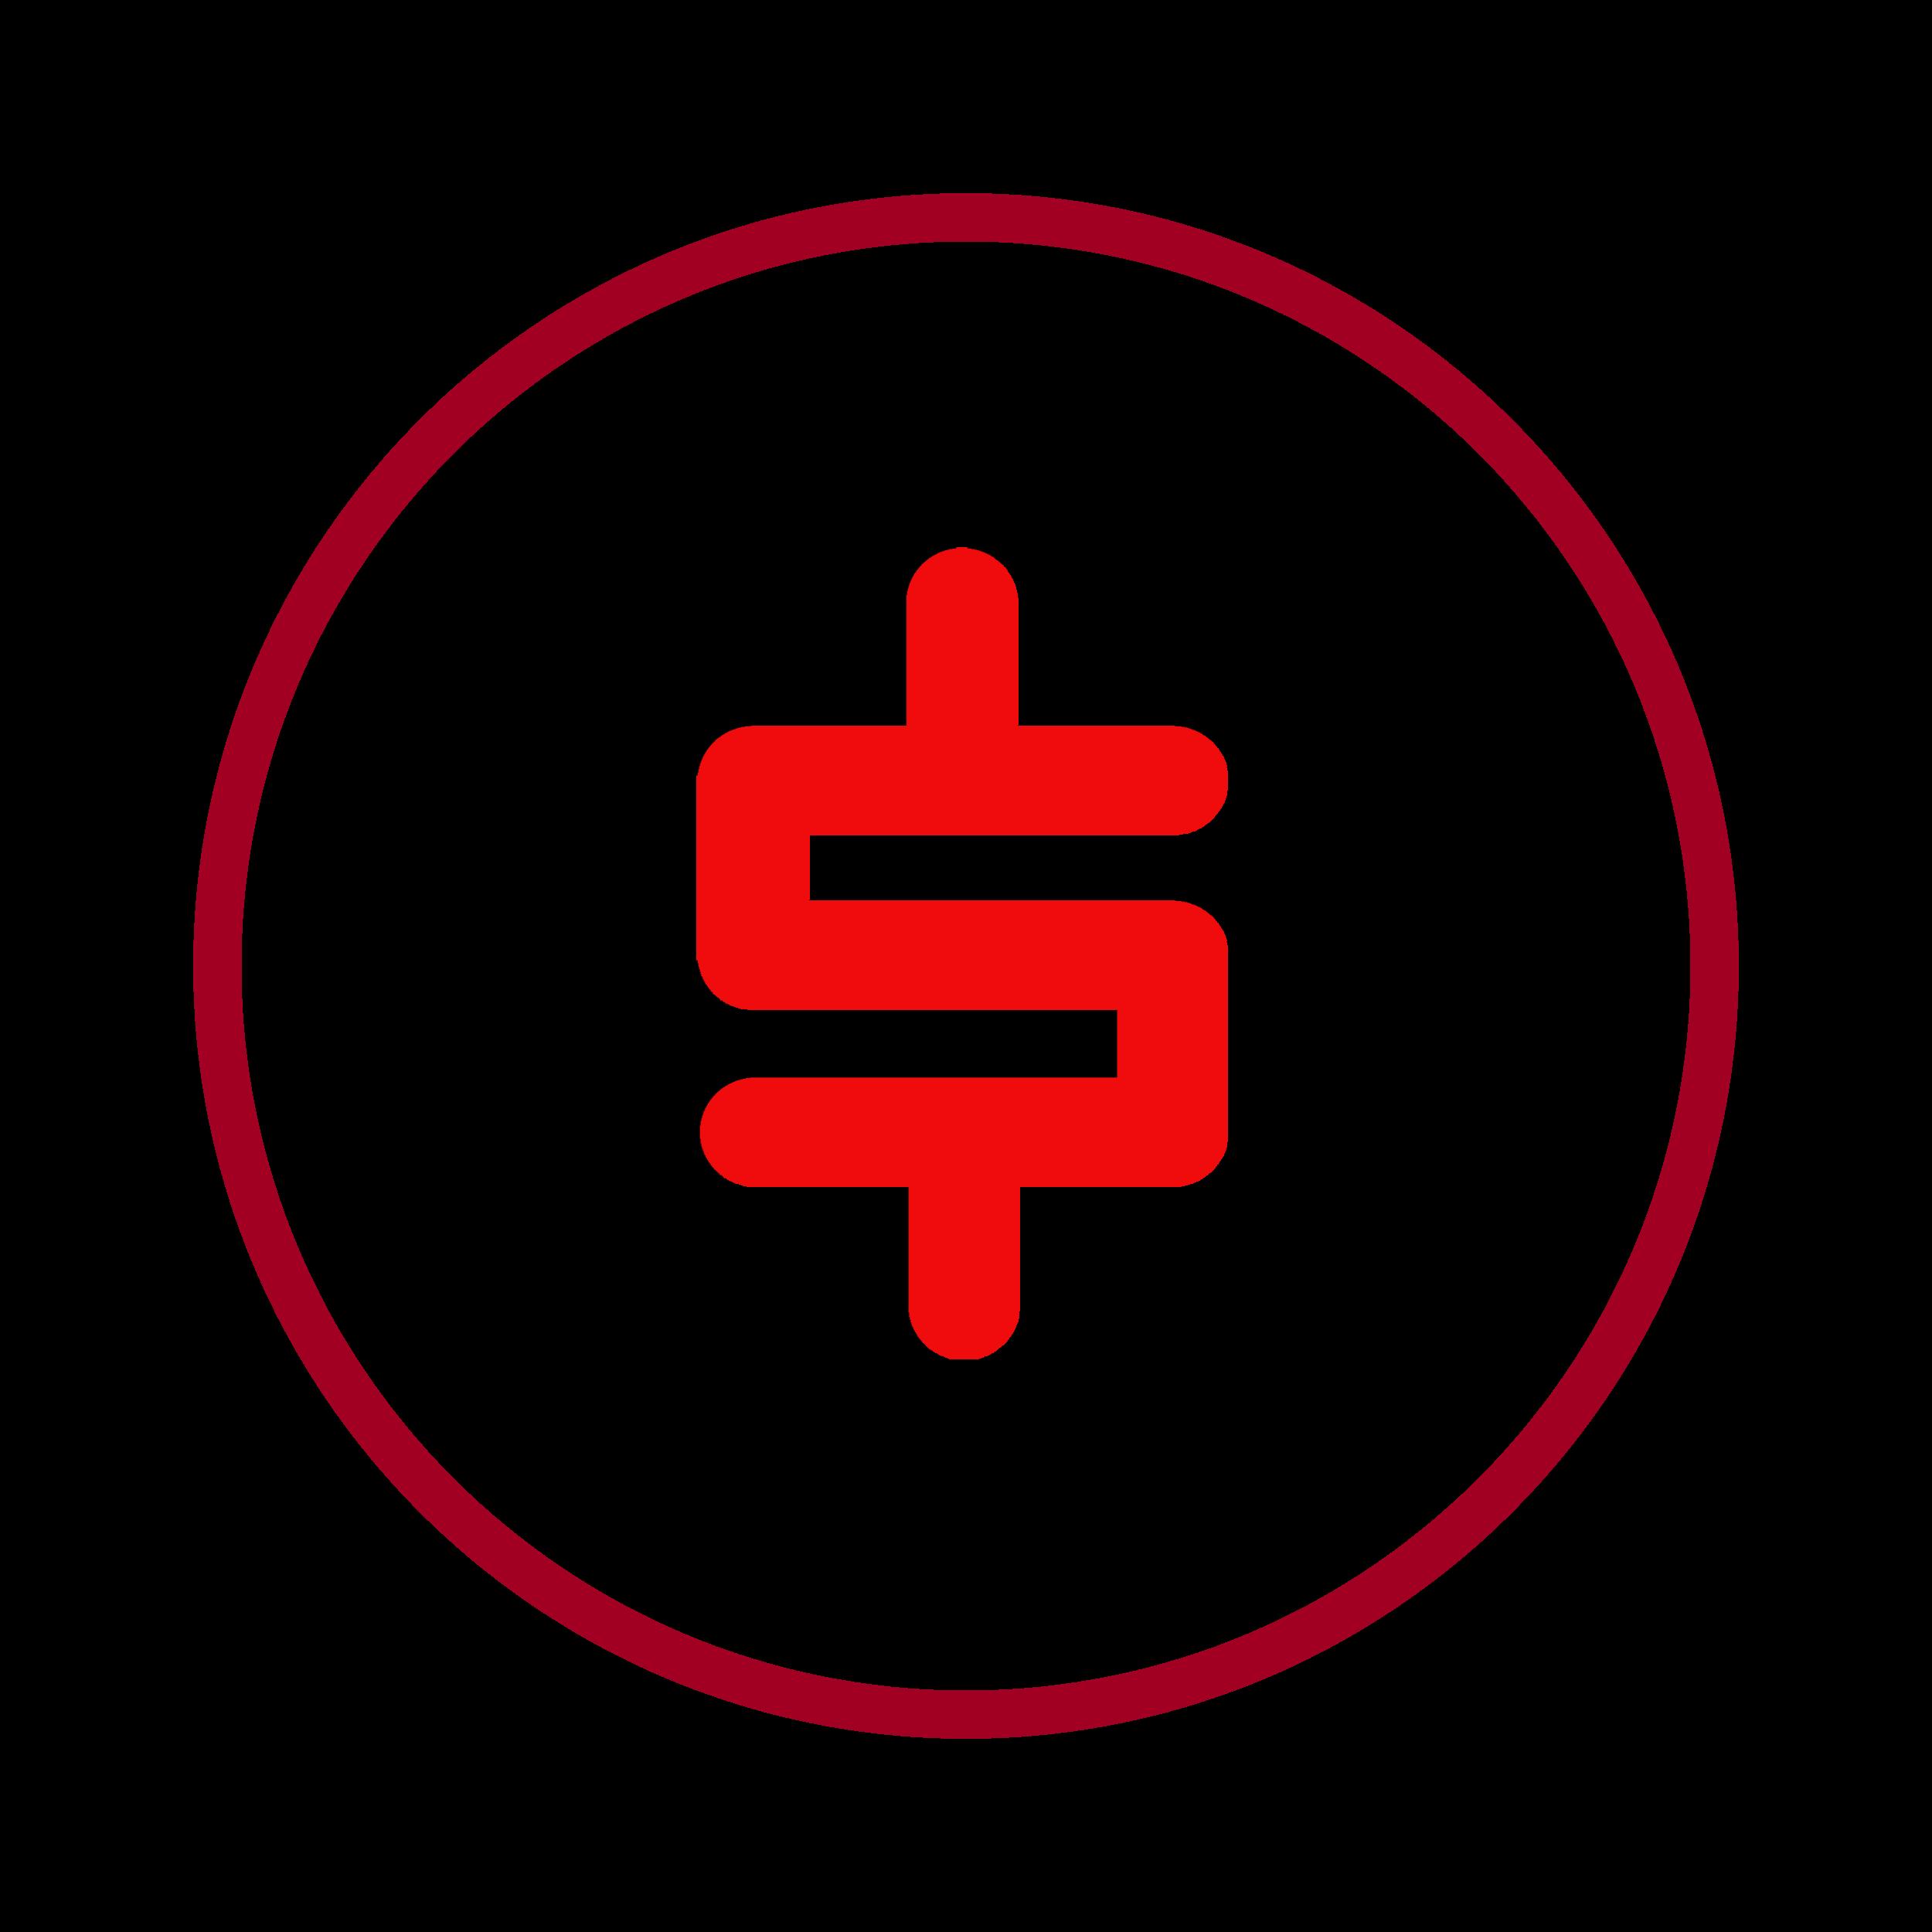 dollar_icon_redd.png